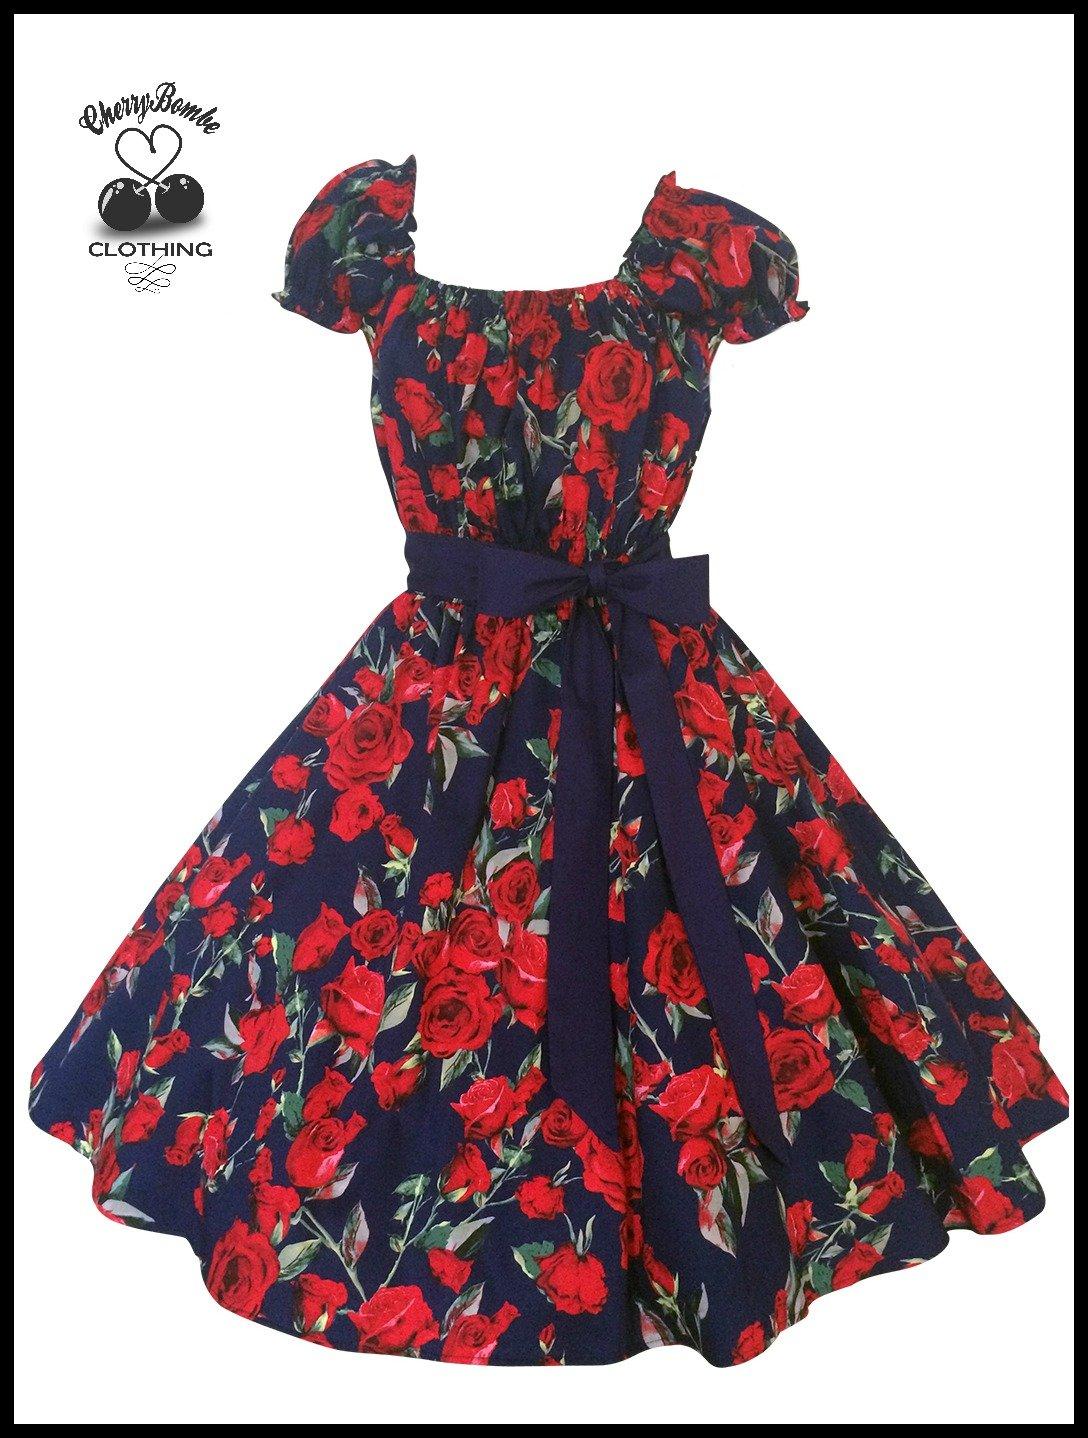 Women's Vintage 50's Style Navy Rose Print Swing Dress, Rockabilly, Wedding, Plus Size 2X 3X